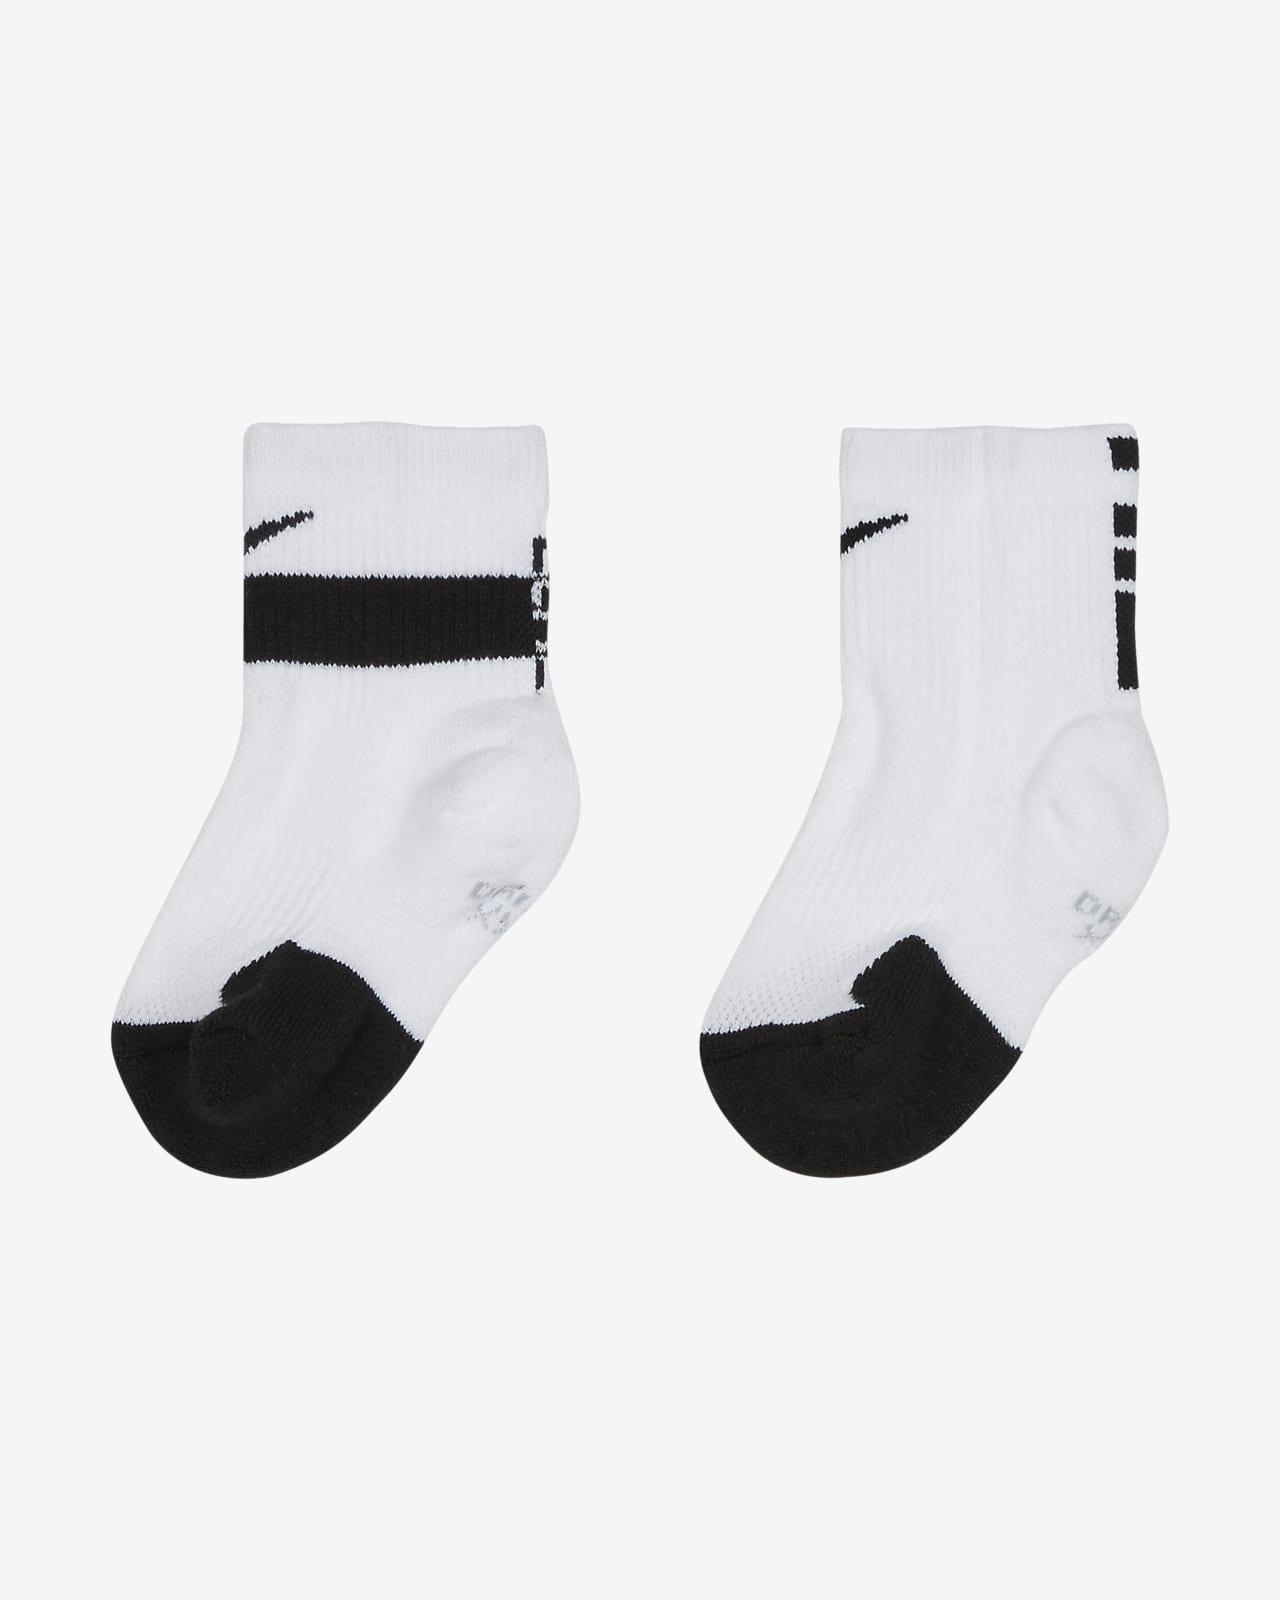 Calcetines largos para niños pequeños Nike Dri-FIT Elite